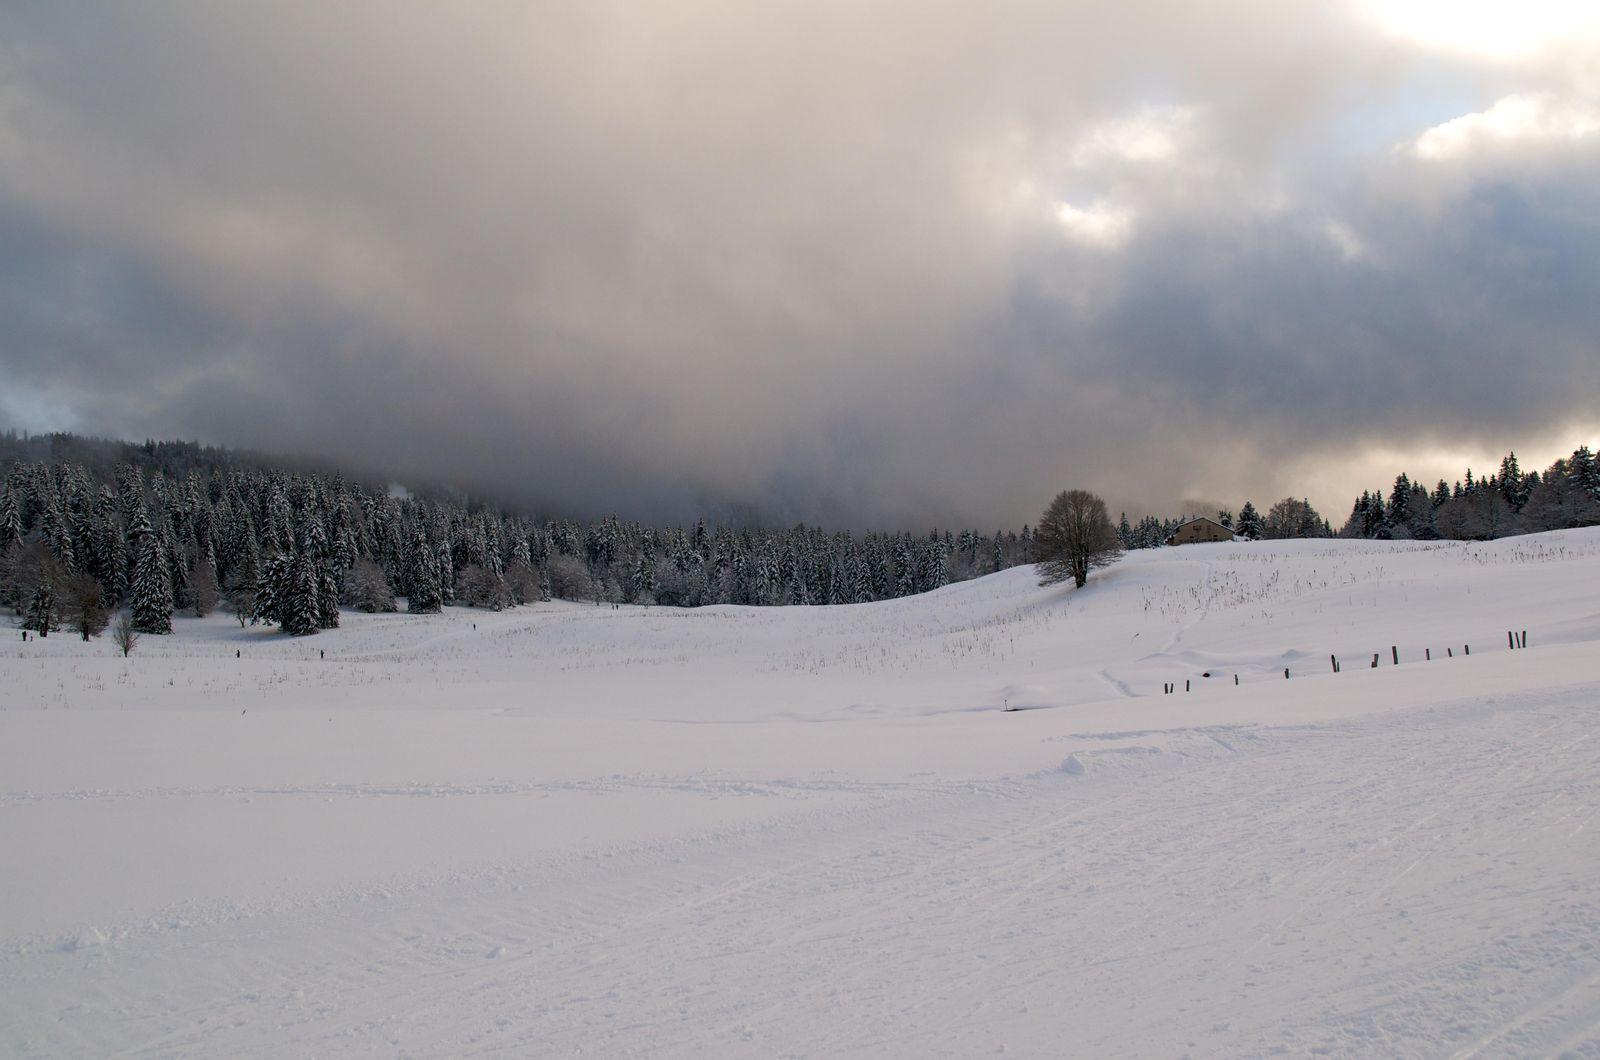 Domaine skiable MONTS JURA/LA VATTAY_Gex (1)